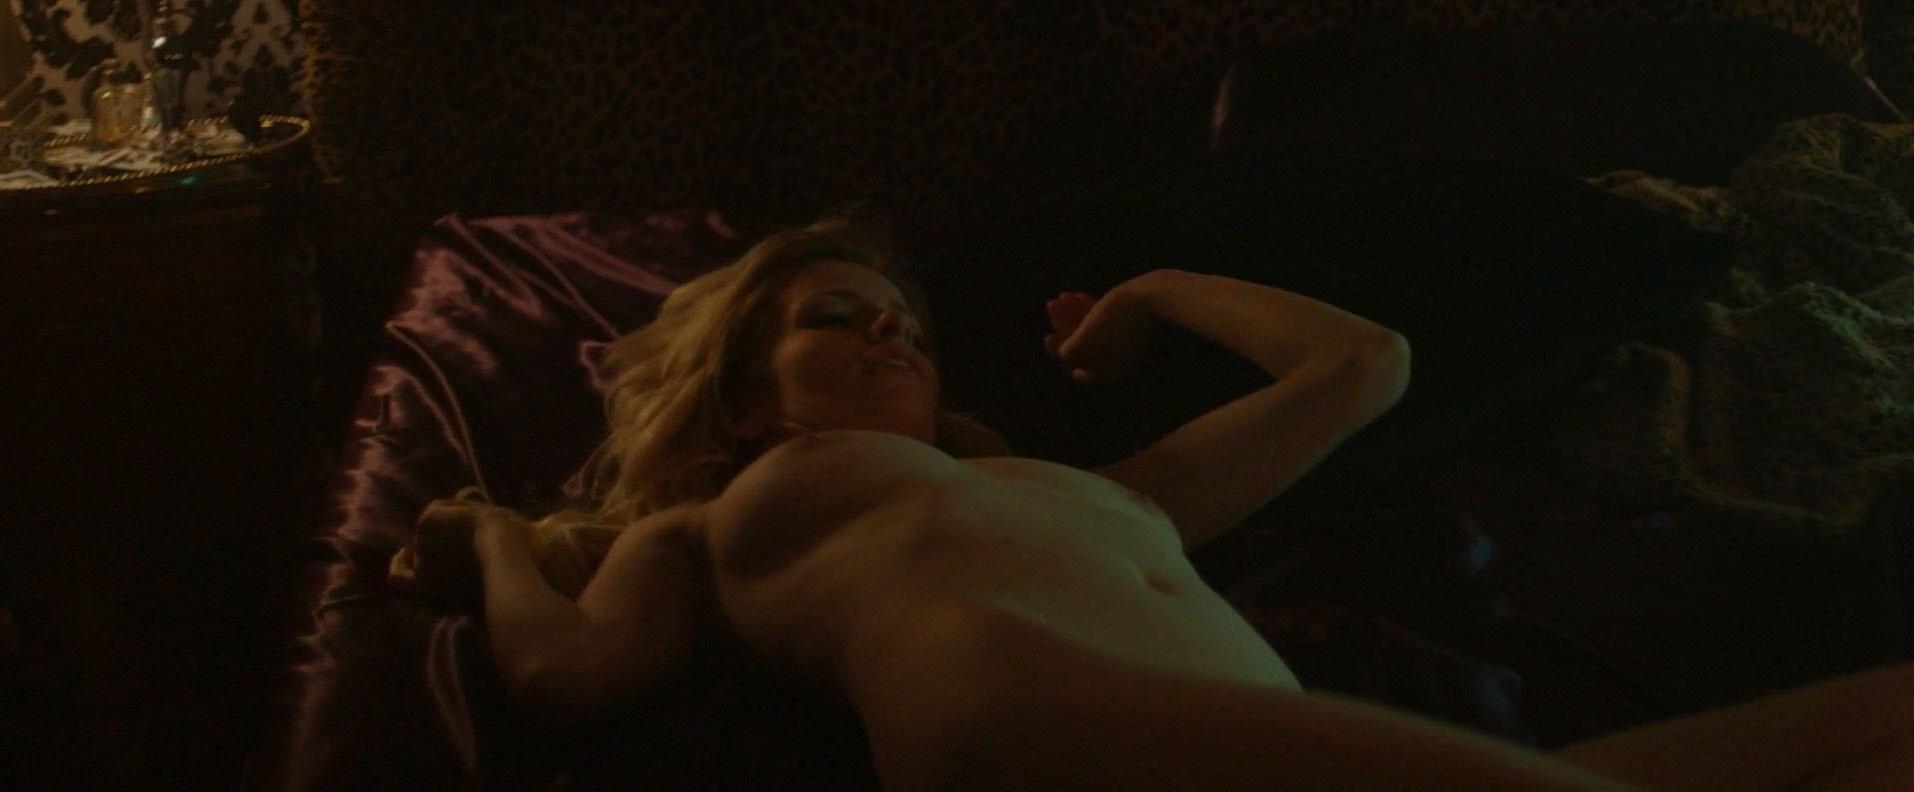 Cody Renee Cameron nude - Officer Downe (2016)